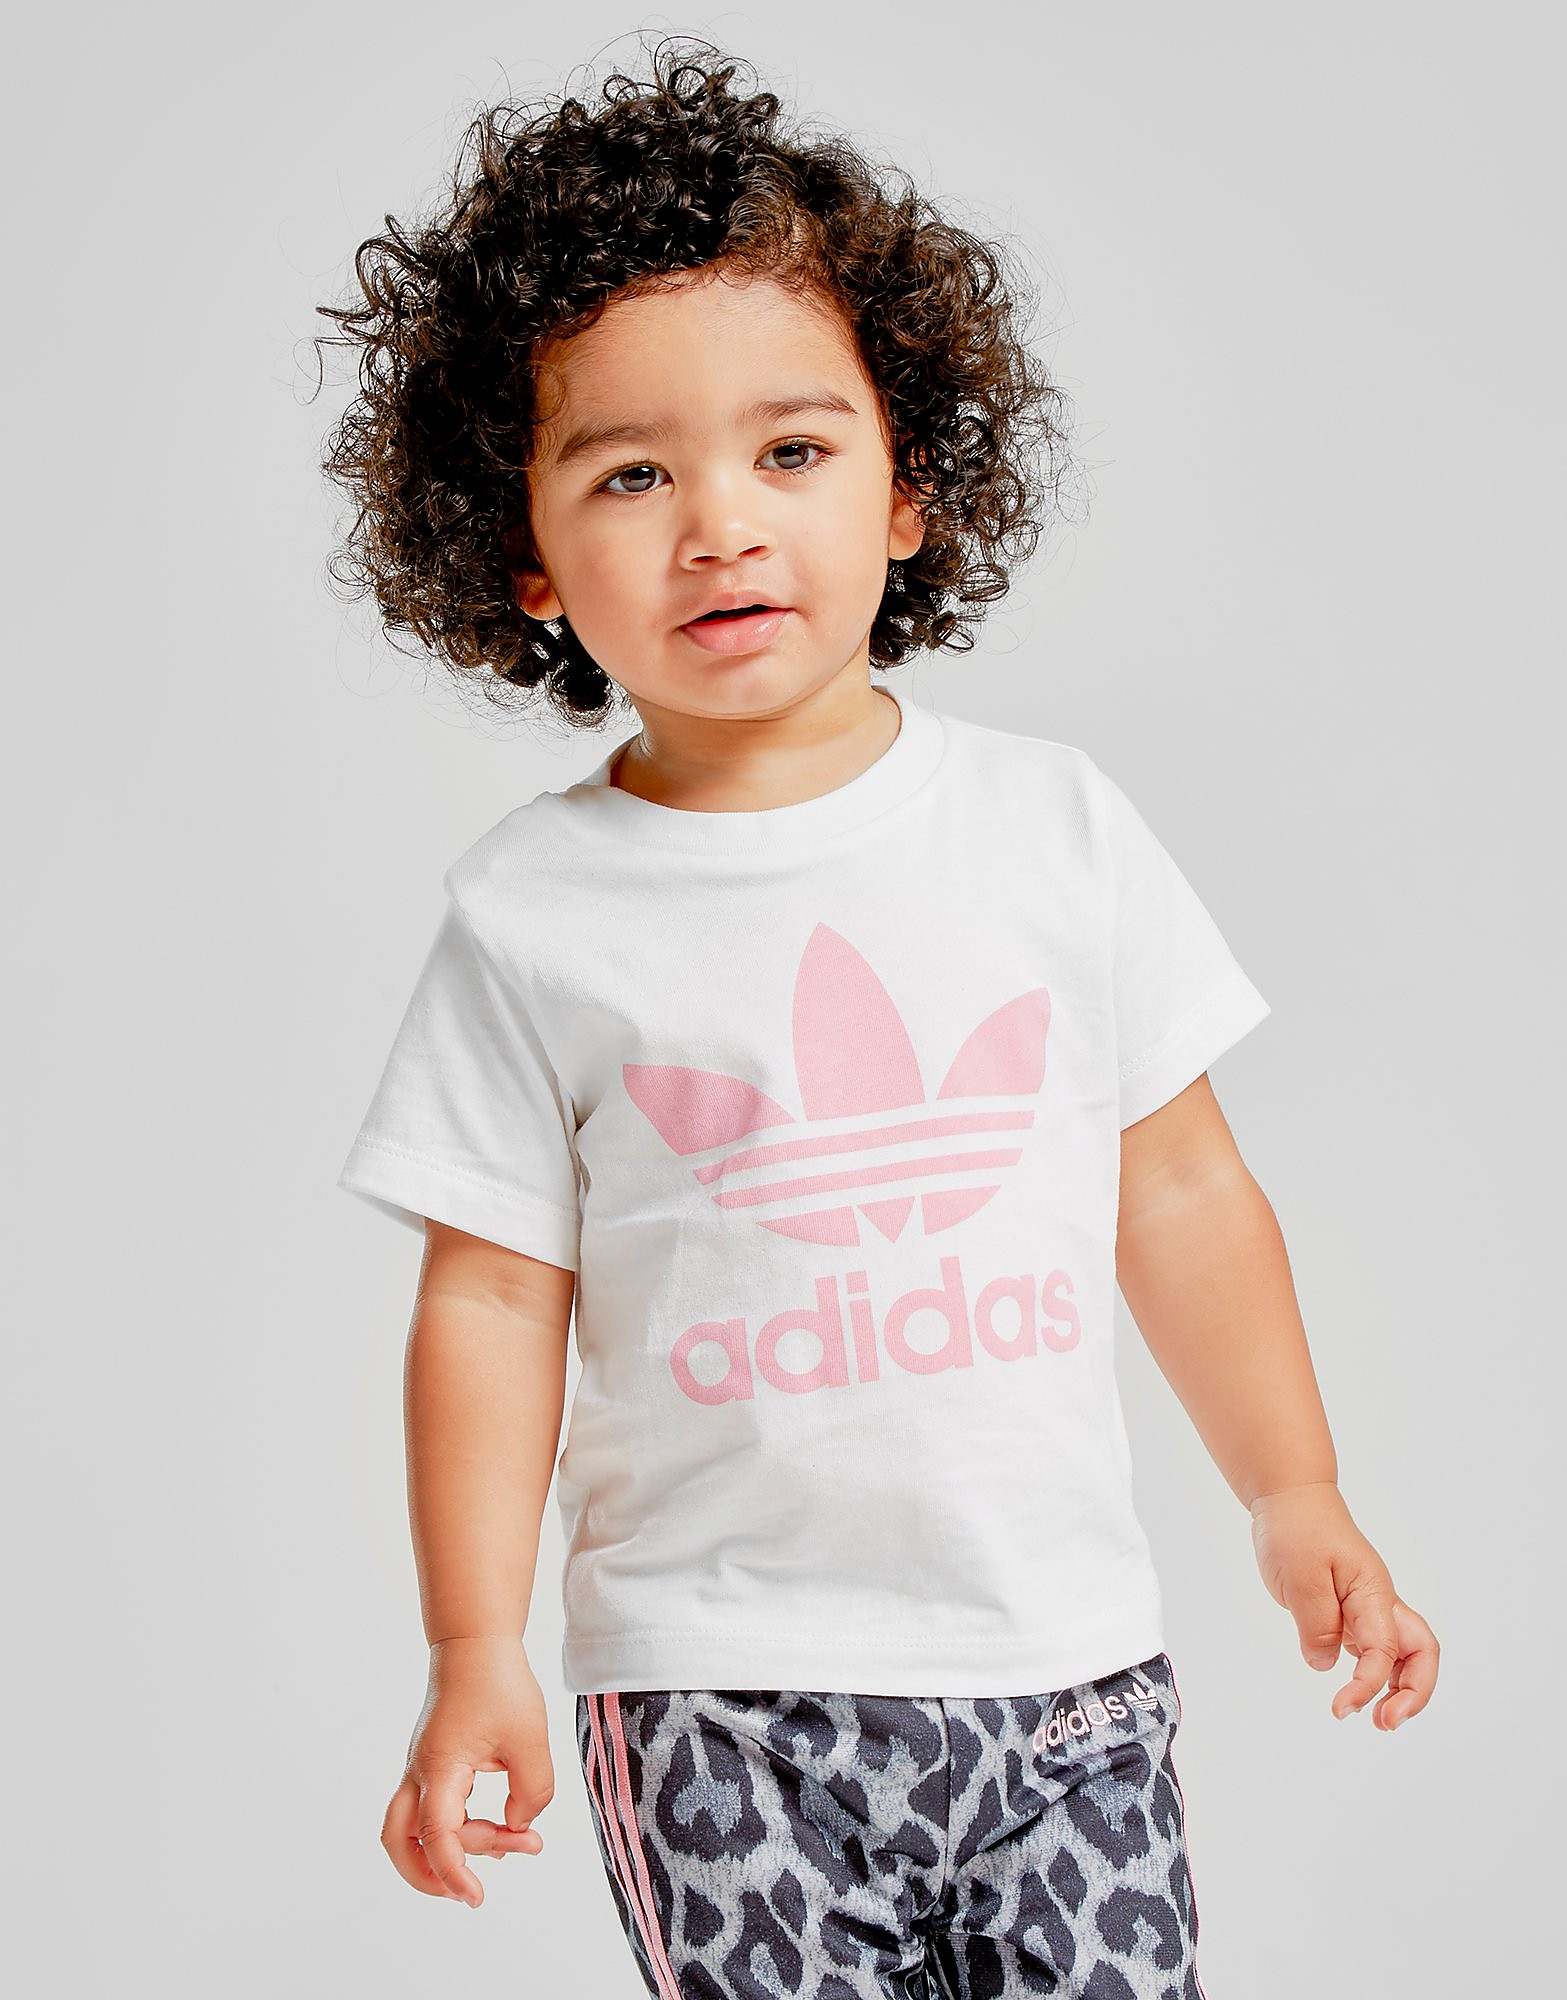 adidas Originals Girls' Trefoil T-Shirt Baby's - Wit - Kind